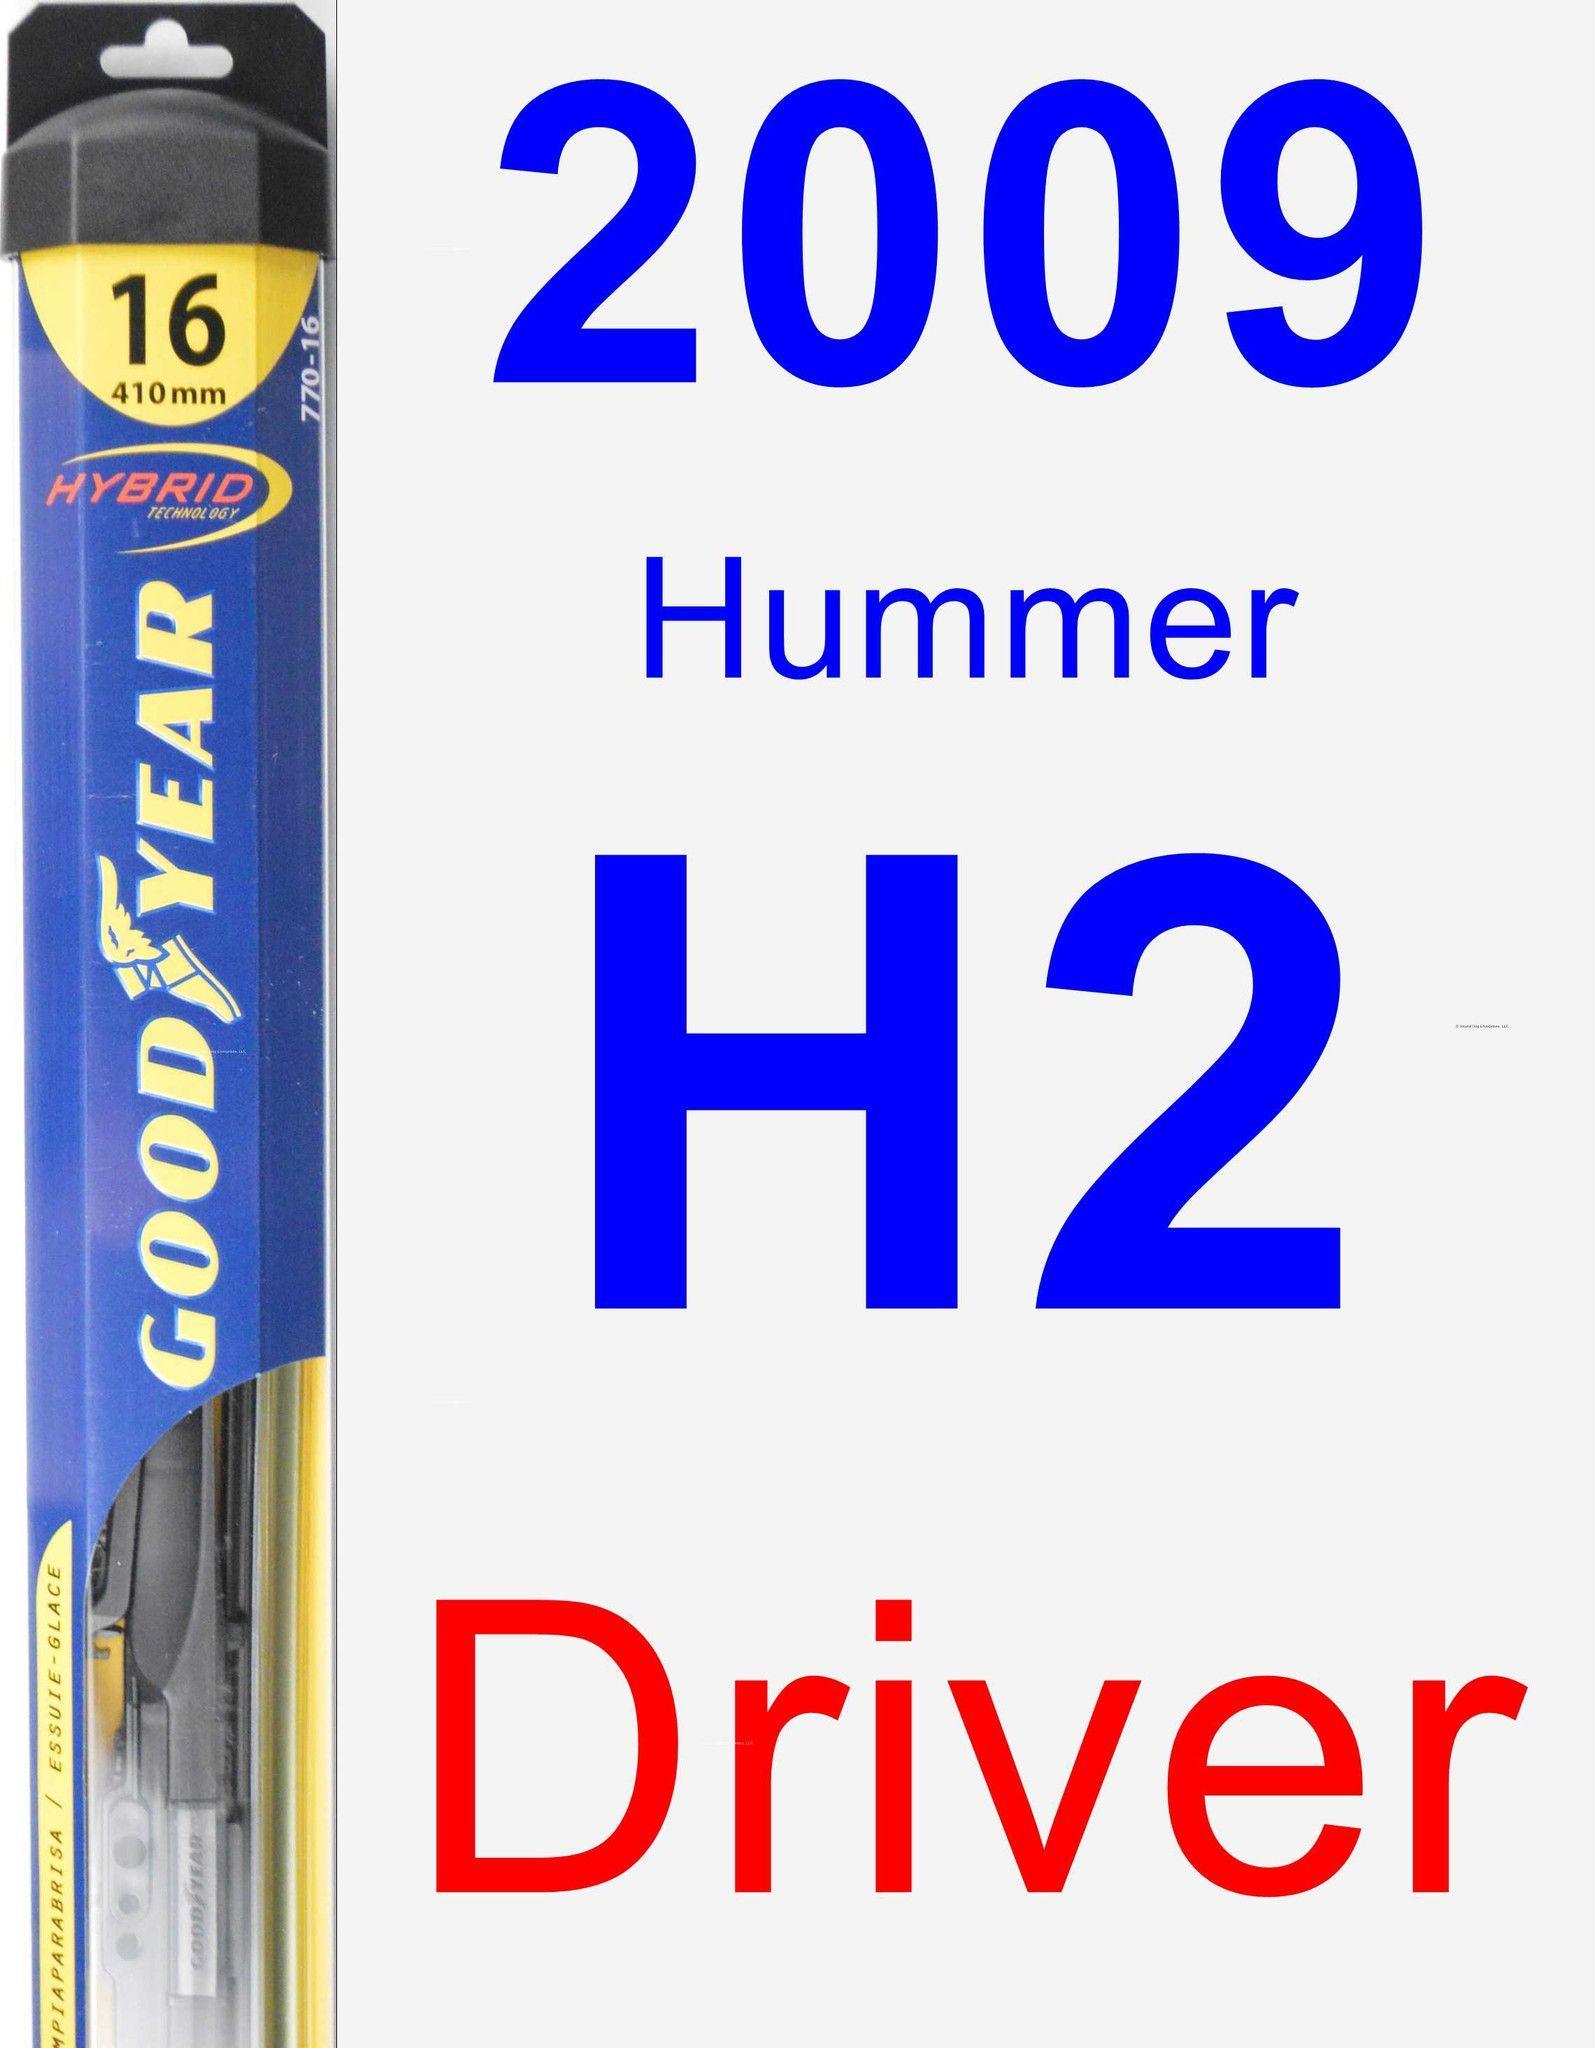 Driver Wiper Blade for 2009 Hummer H2 - Hybrid